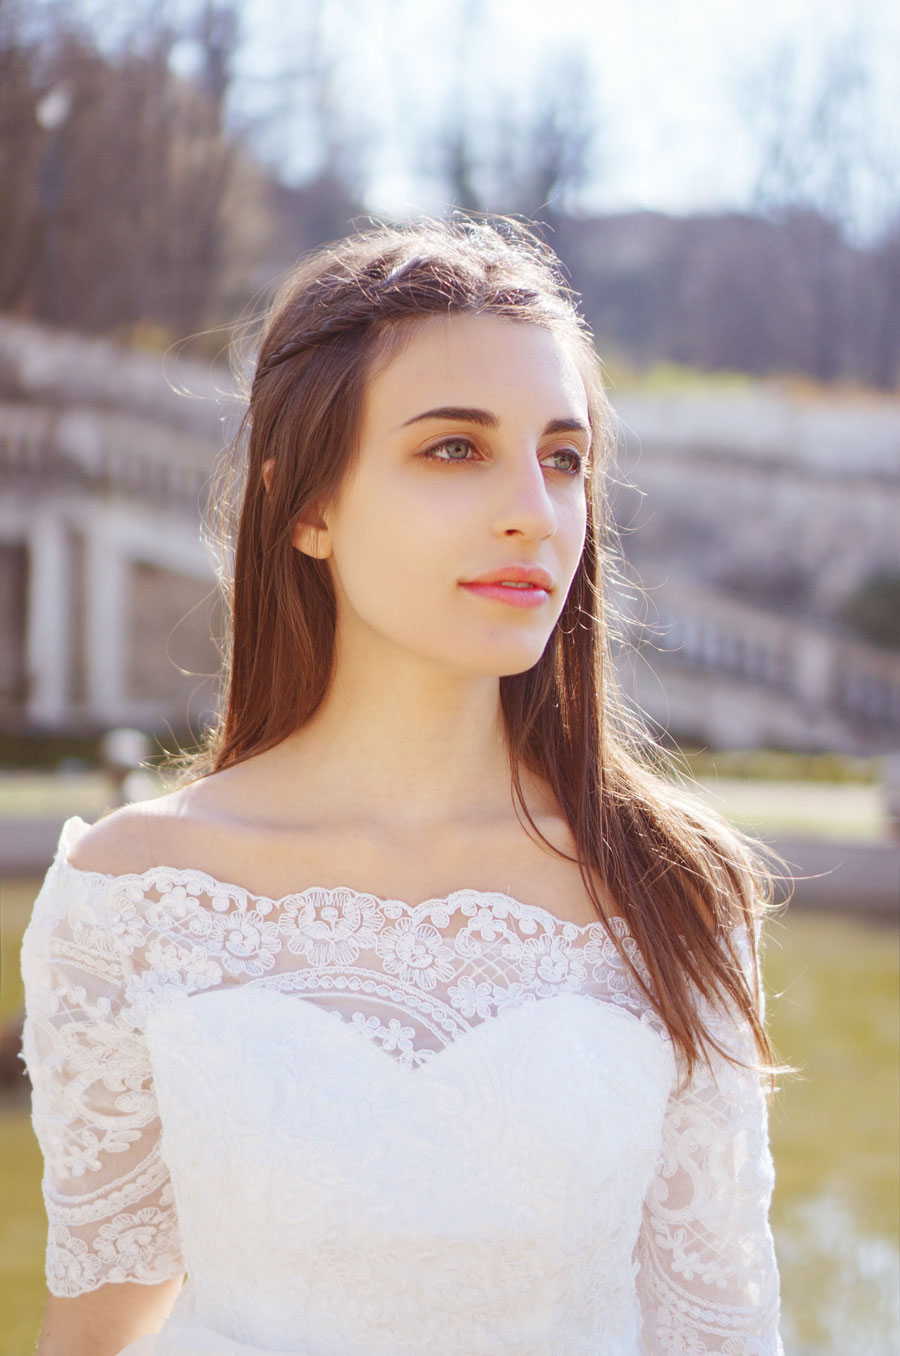 Photoshop详细解析唯美婚纱人像后期教程,PS教程,思缘教程网